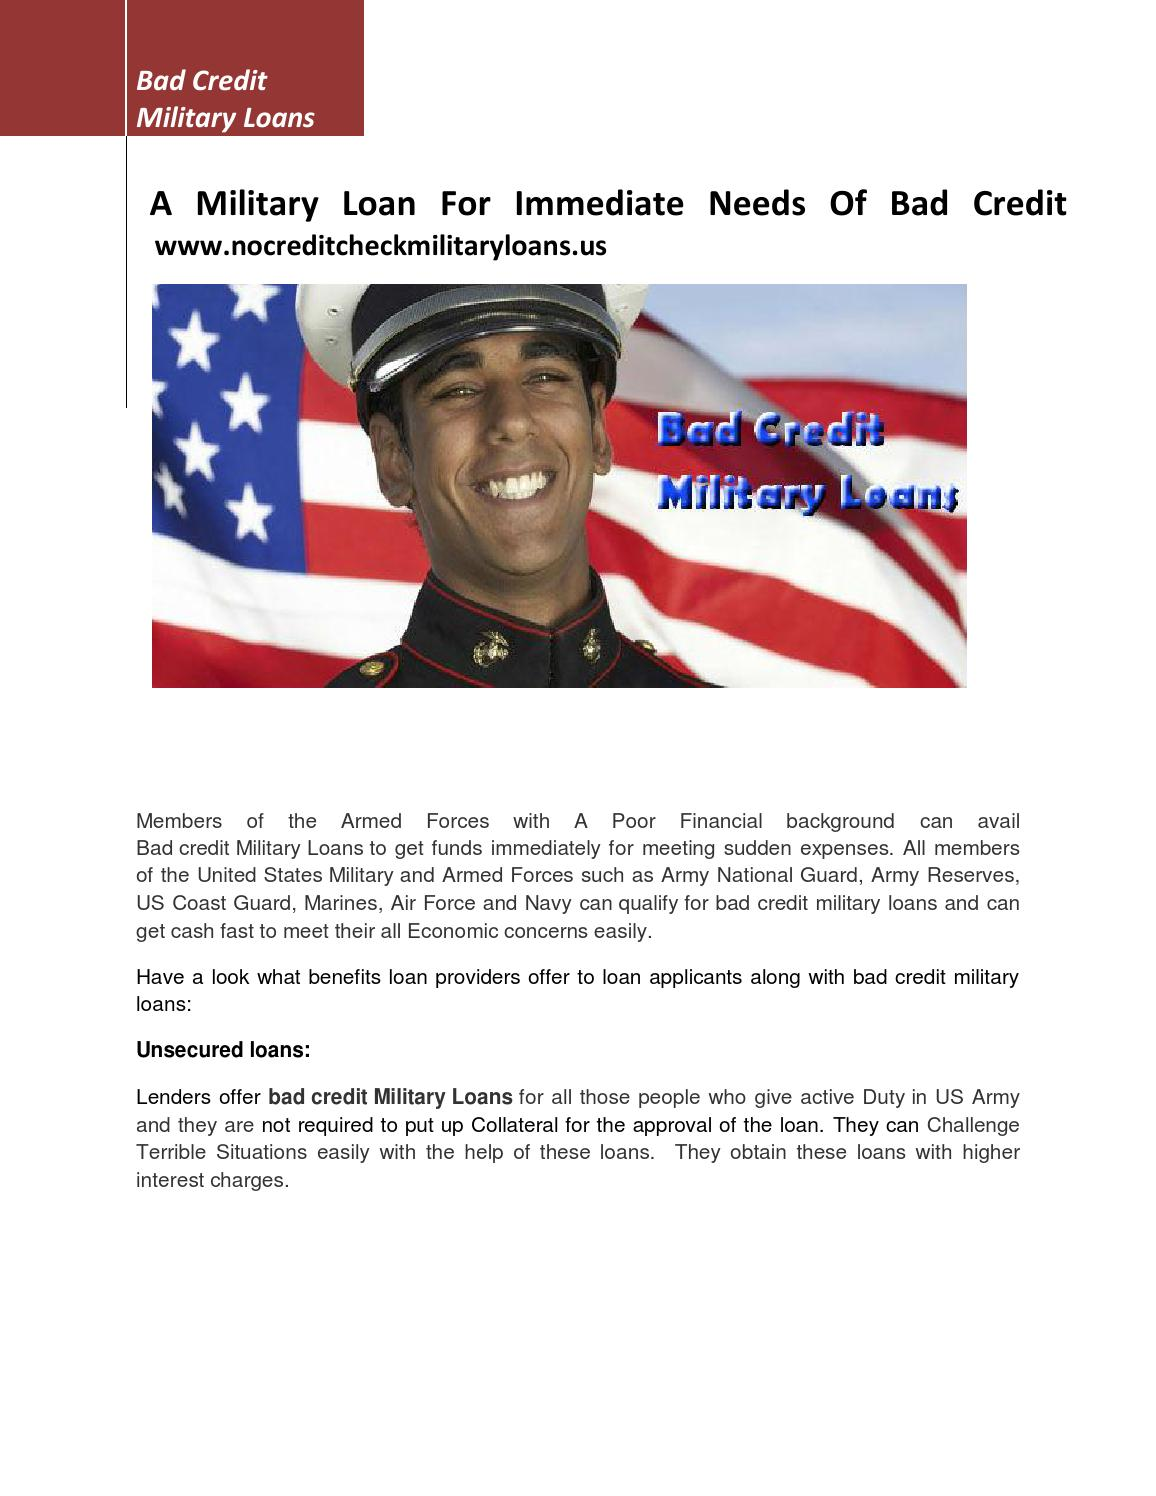 Bad Credit Military Loans >> Bad Credit Military Loans By Majid Frank Issuu